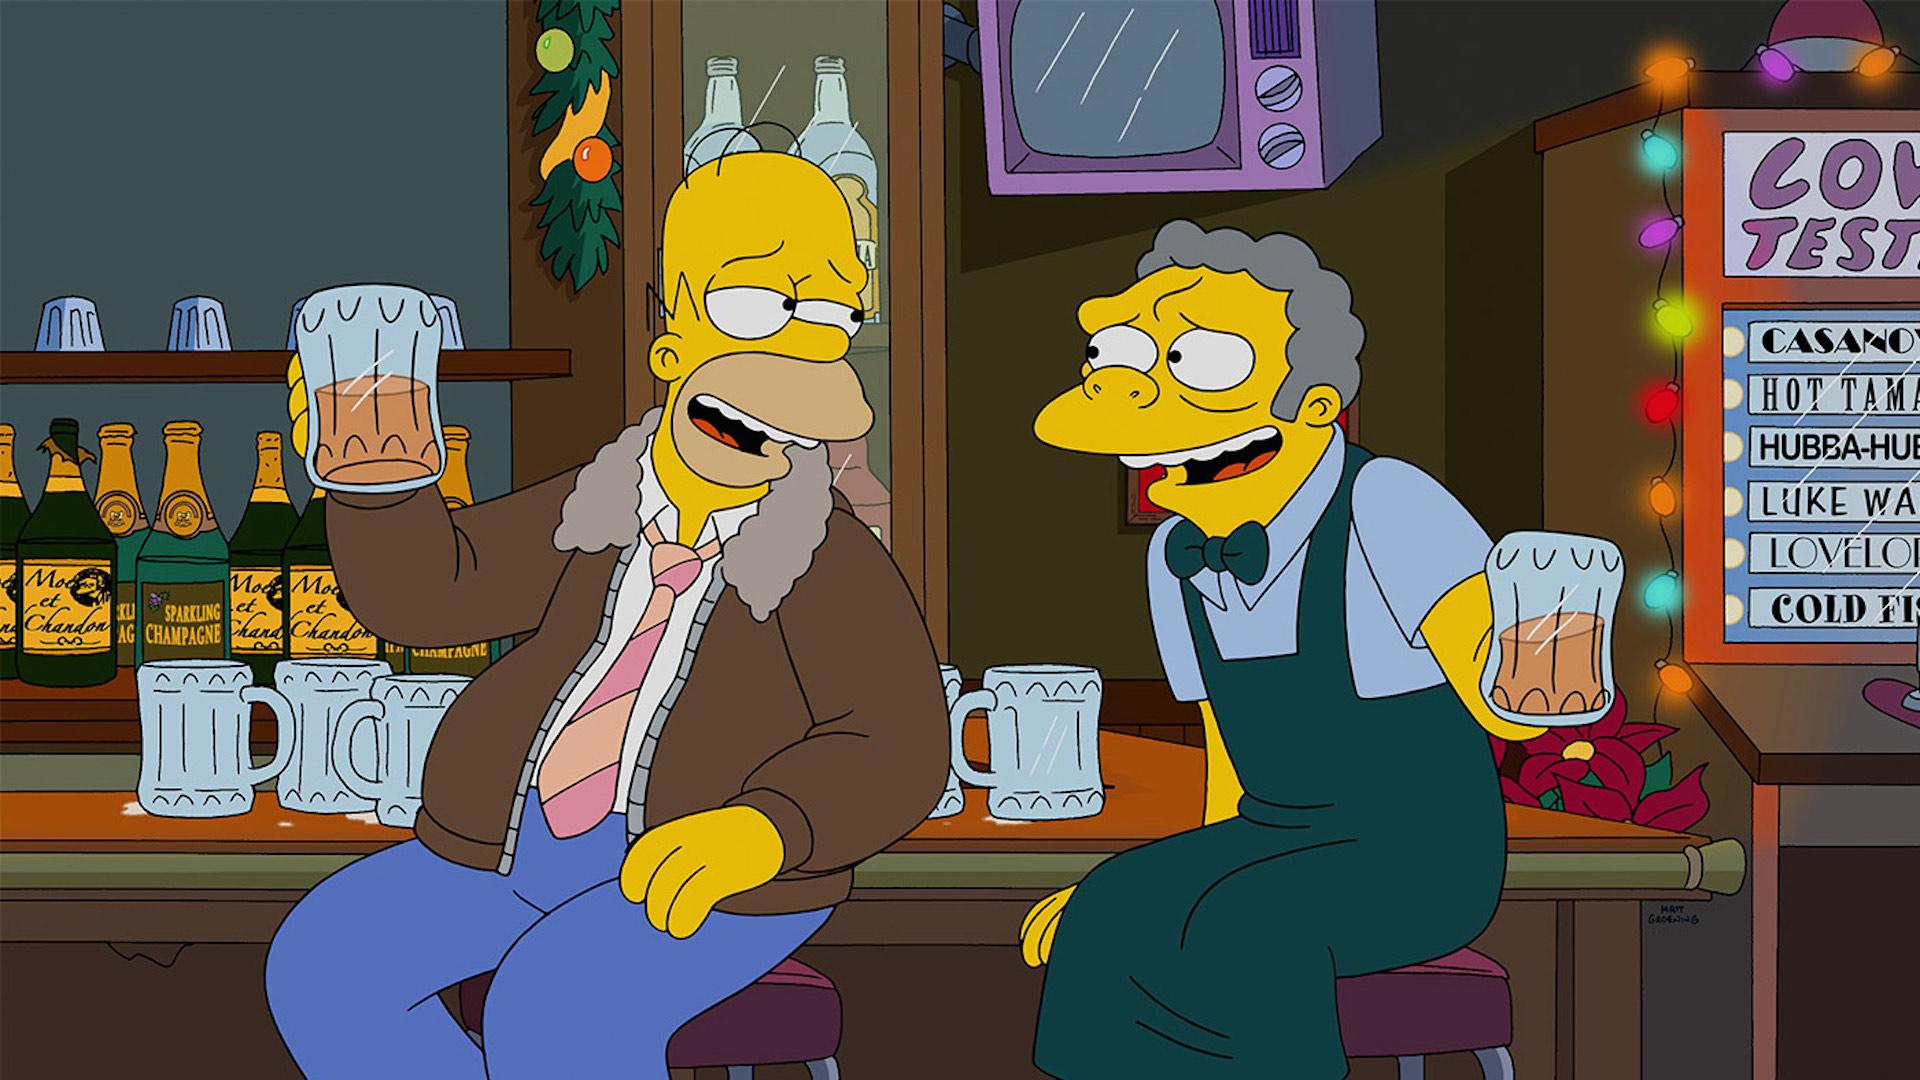 Moe from 'The Simpsons' Sends Uplifting Message to San Juan's Mayor Carmen Yulín Cruz